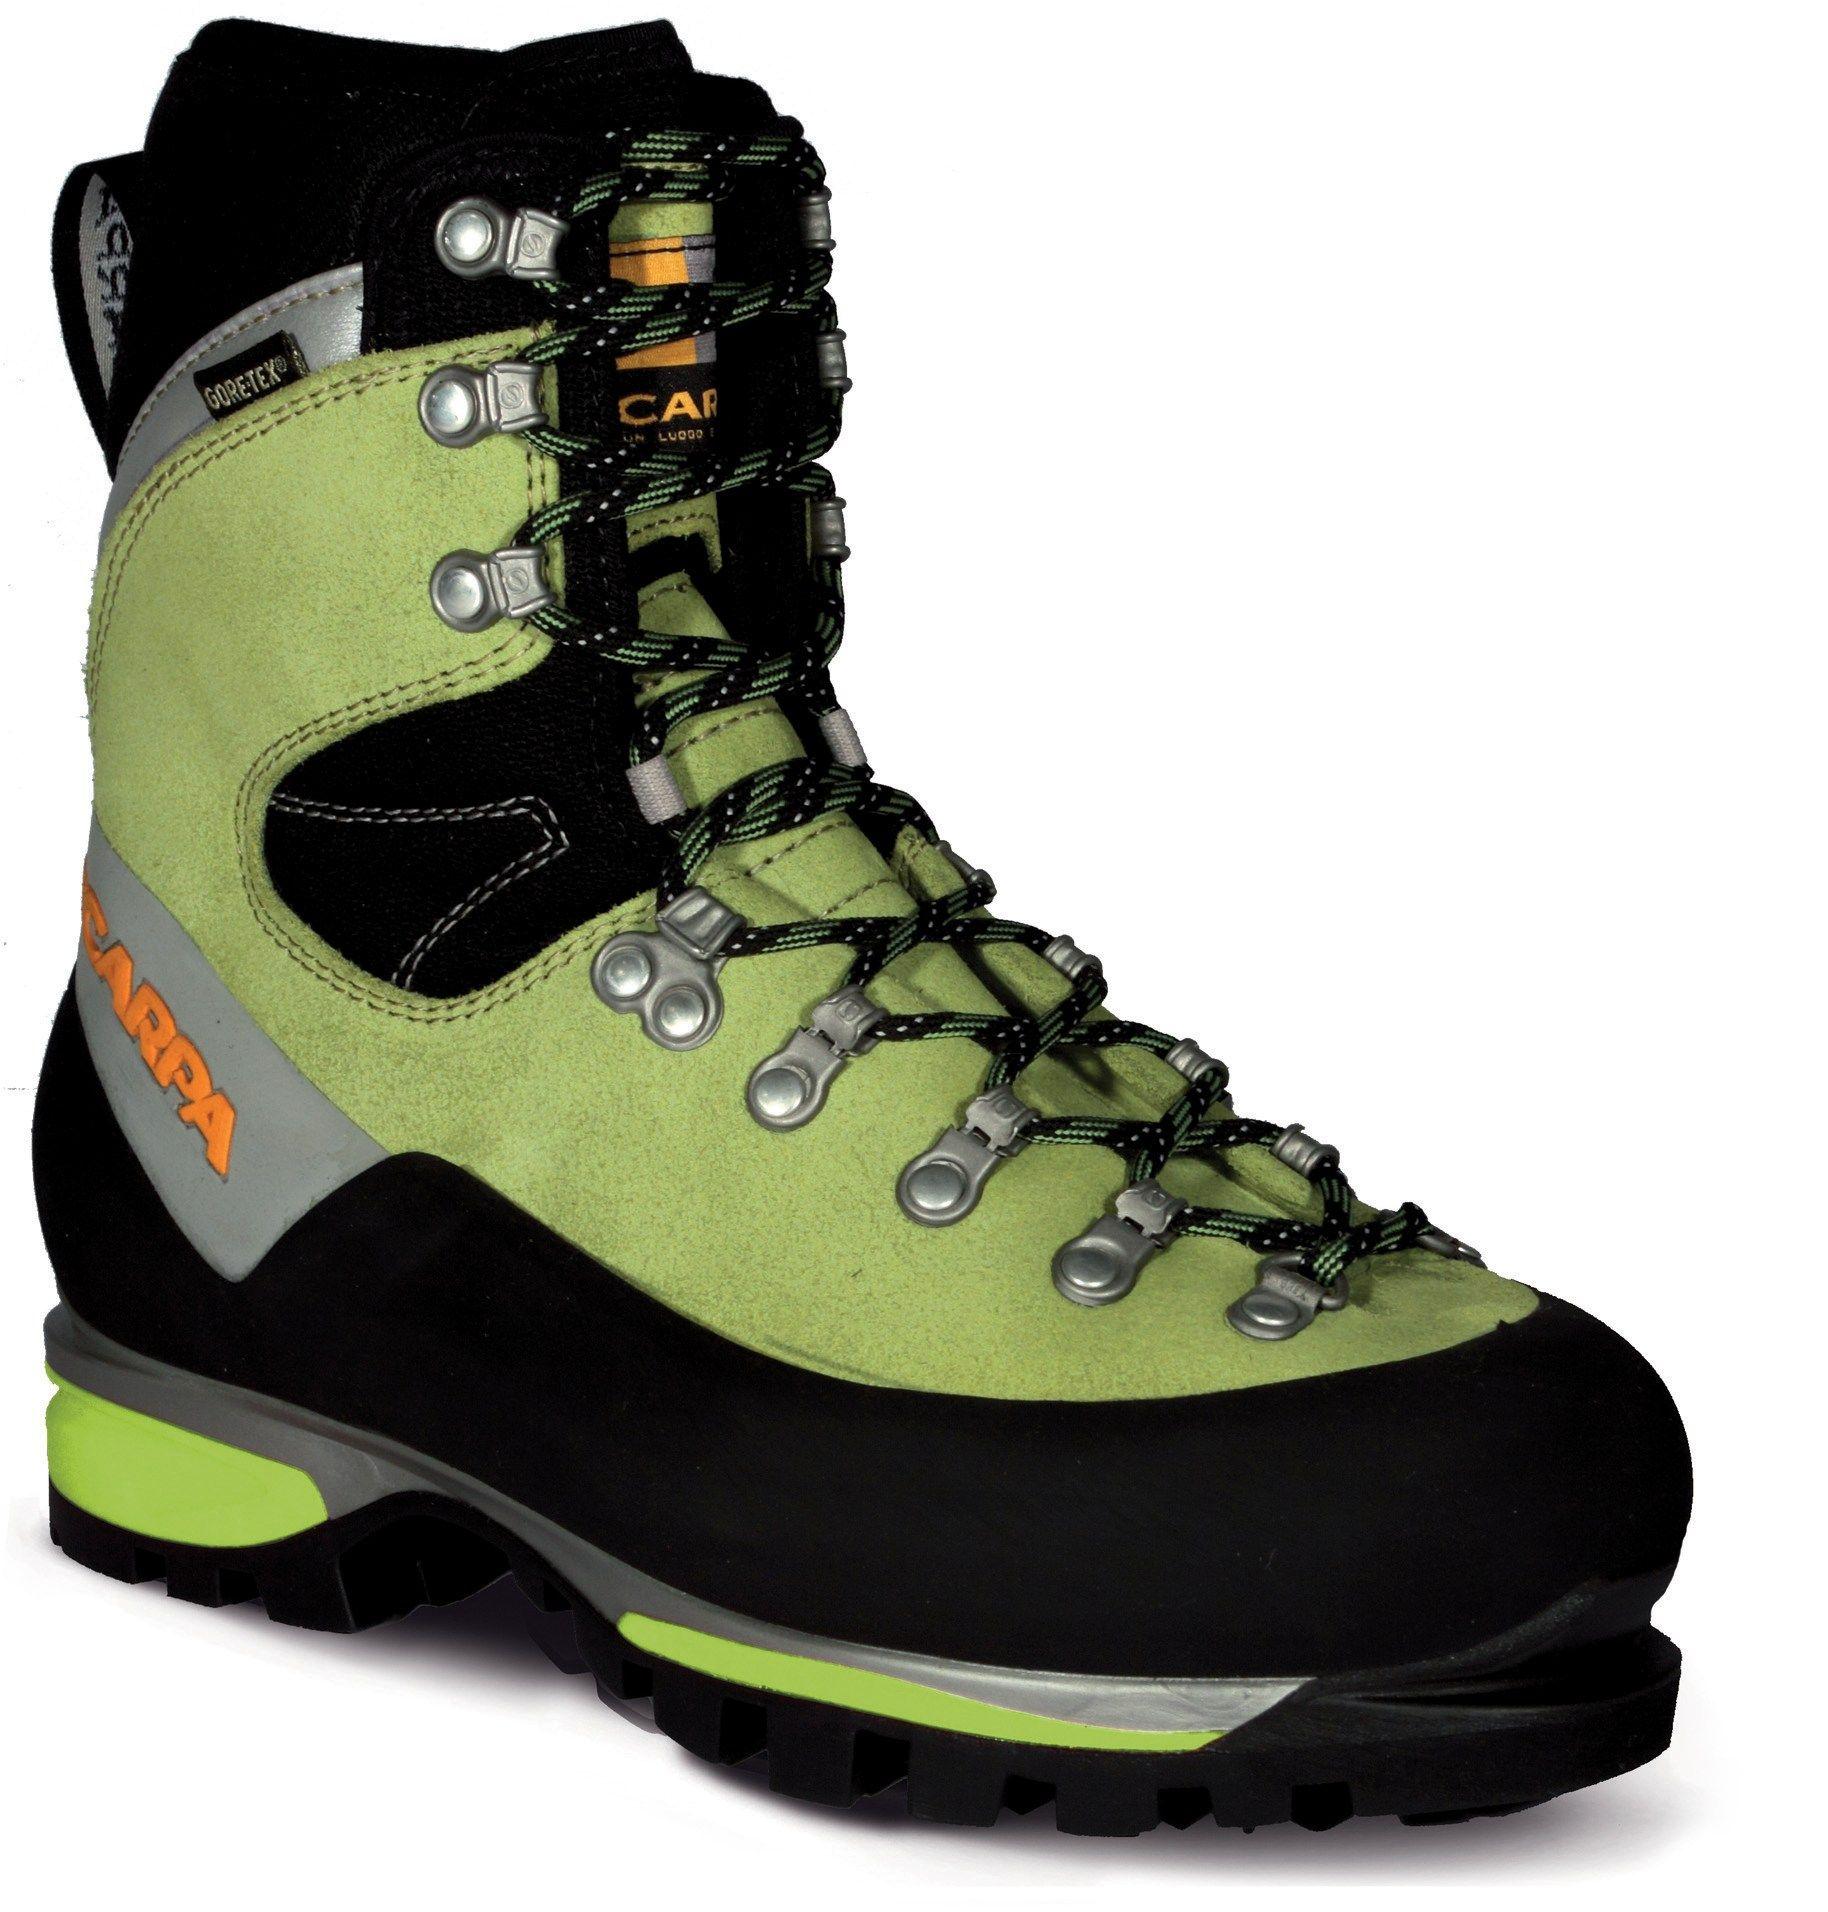 Scarpa Mont Blanc GTX Mountaineering Boots - Women s - Free Shipping at  REI.com Trekking 362ce92e796